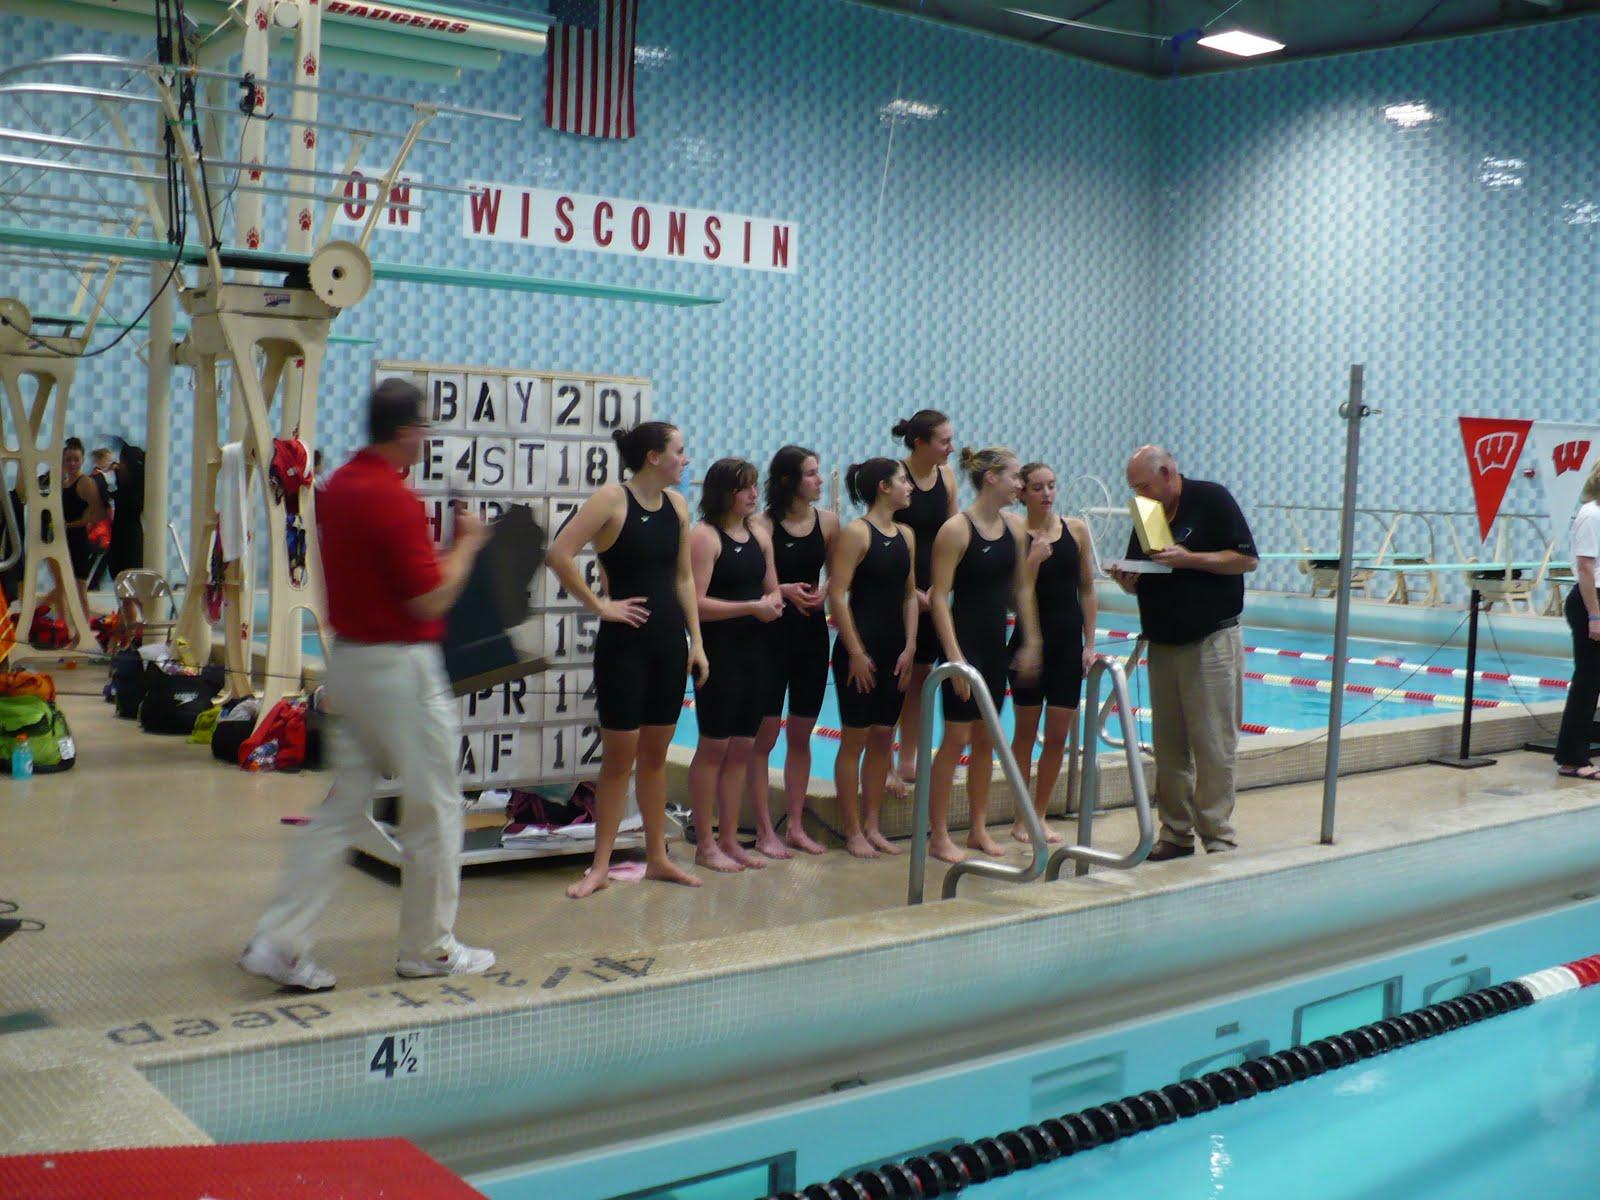 http://3.bp.blogspot.com/_Pb-a0h_1_f8/SwC4jbyHiKI/AAAAAAAAAA0/Xz0sIxCcPqM/s1600/stateswimgirls09+043.JPG